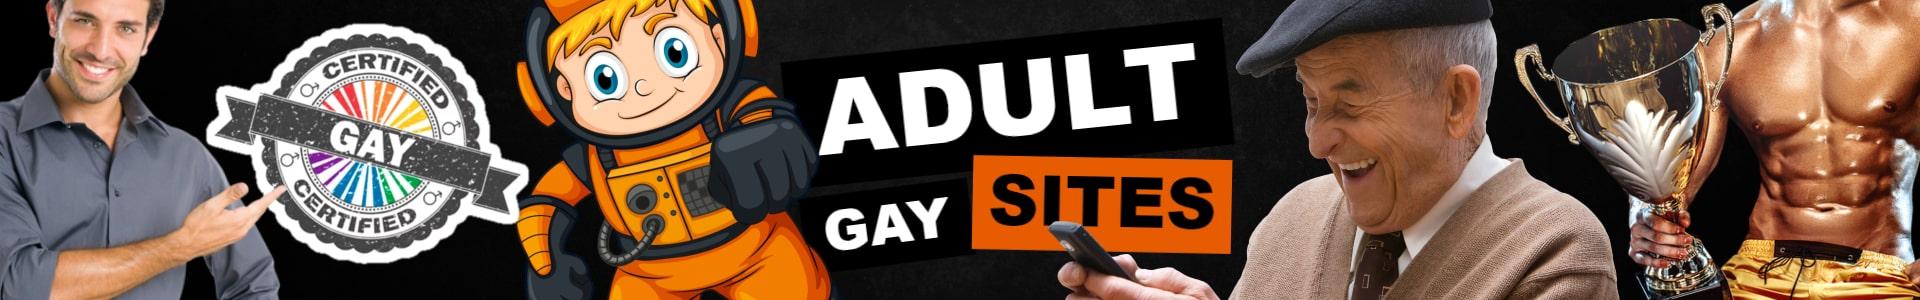 Adult Gay Sites